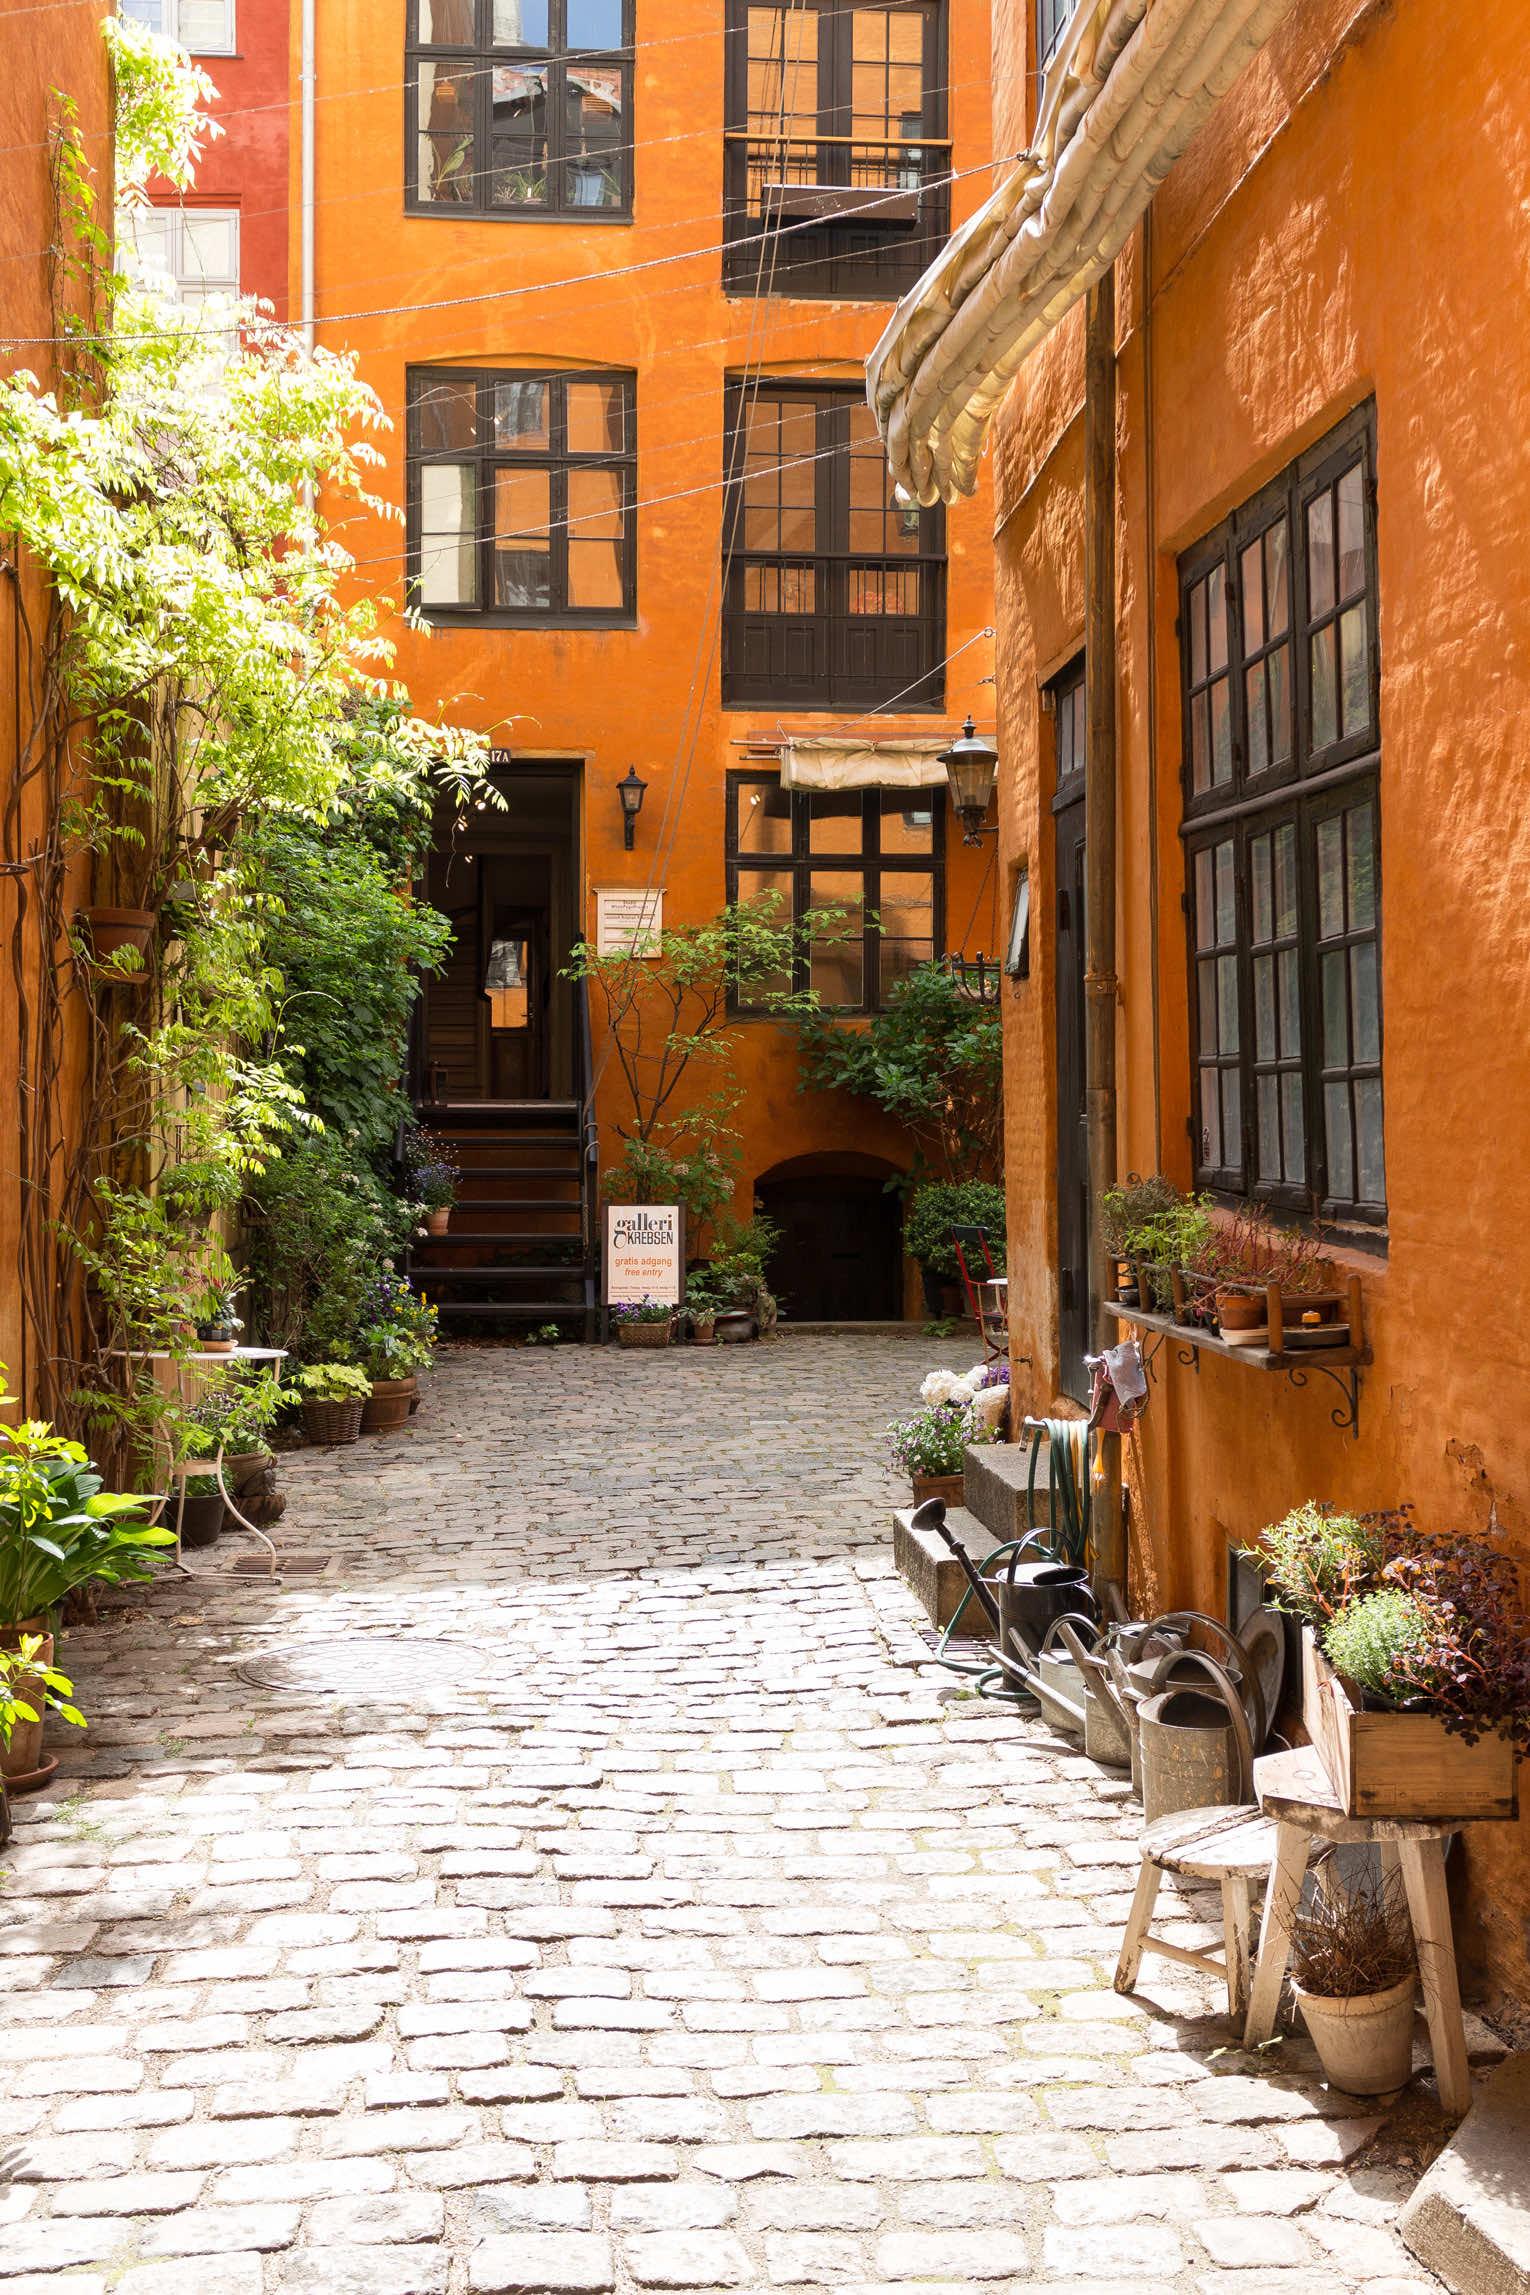 Köpenhamn gamla hus